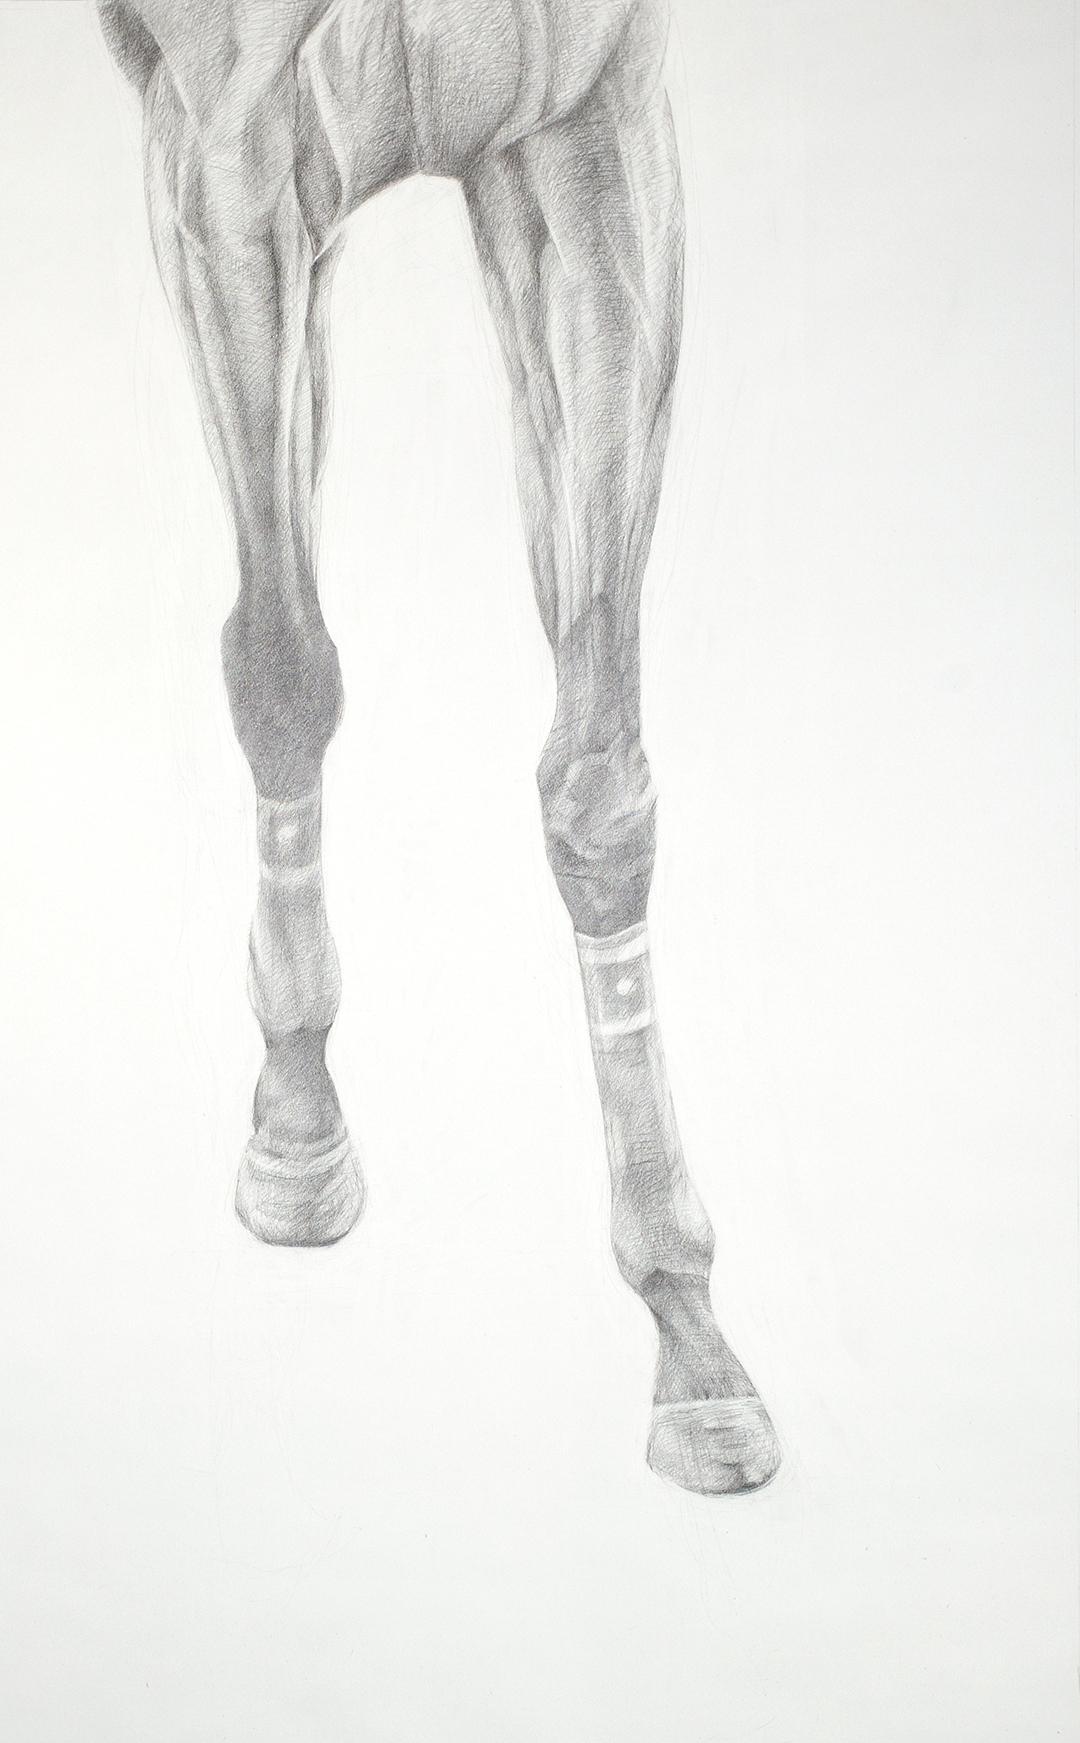 Walking-©Brandt2012